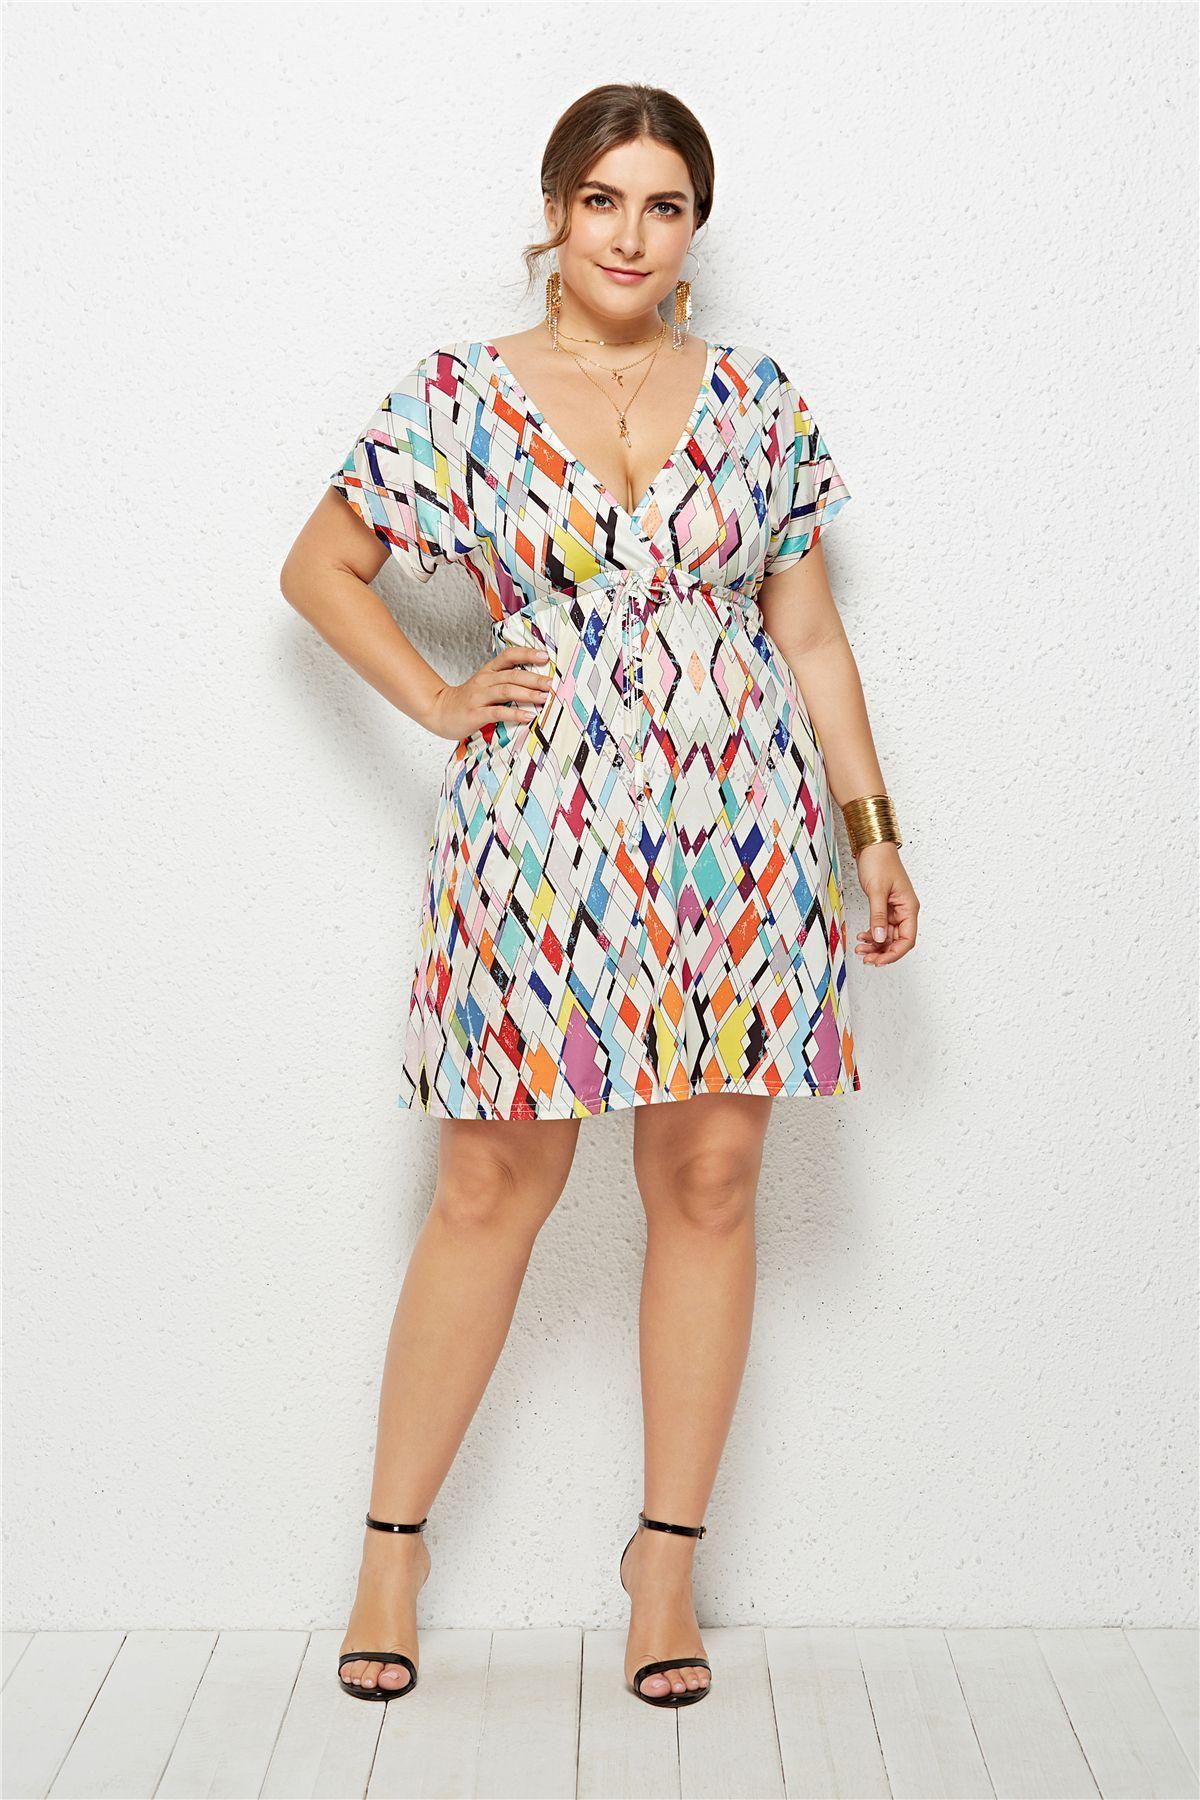 2019 New Women Summer Dress Plus Size Fashion V Neck Digital Print Large  Size Dresses Seaside Beach Vacation Holiday Sundress Tight White Dresses  For ...